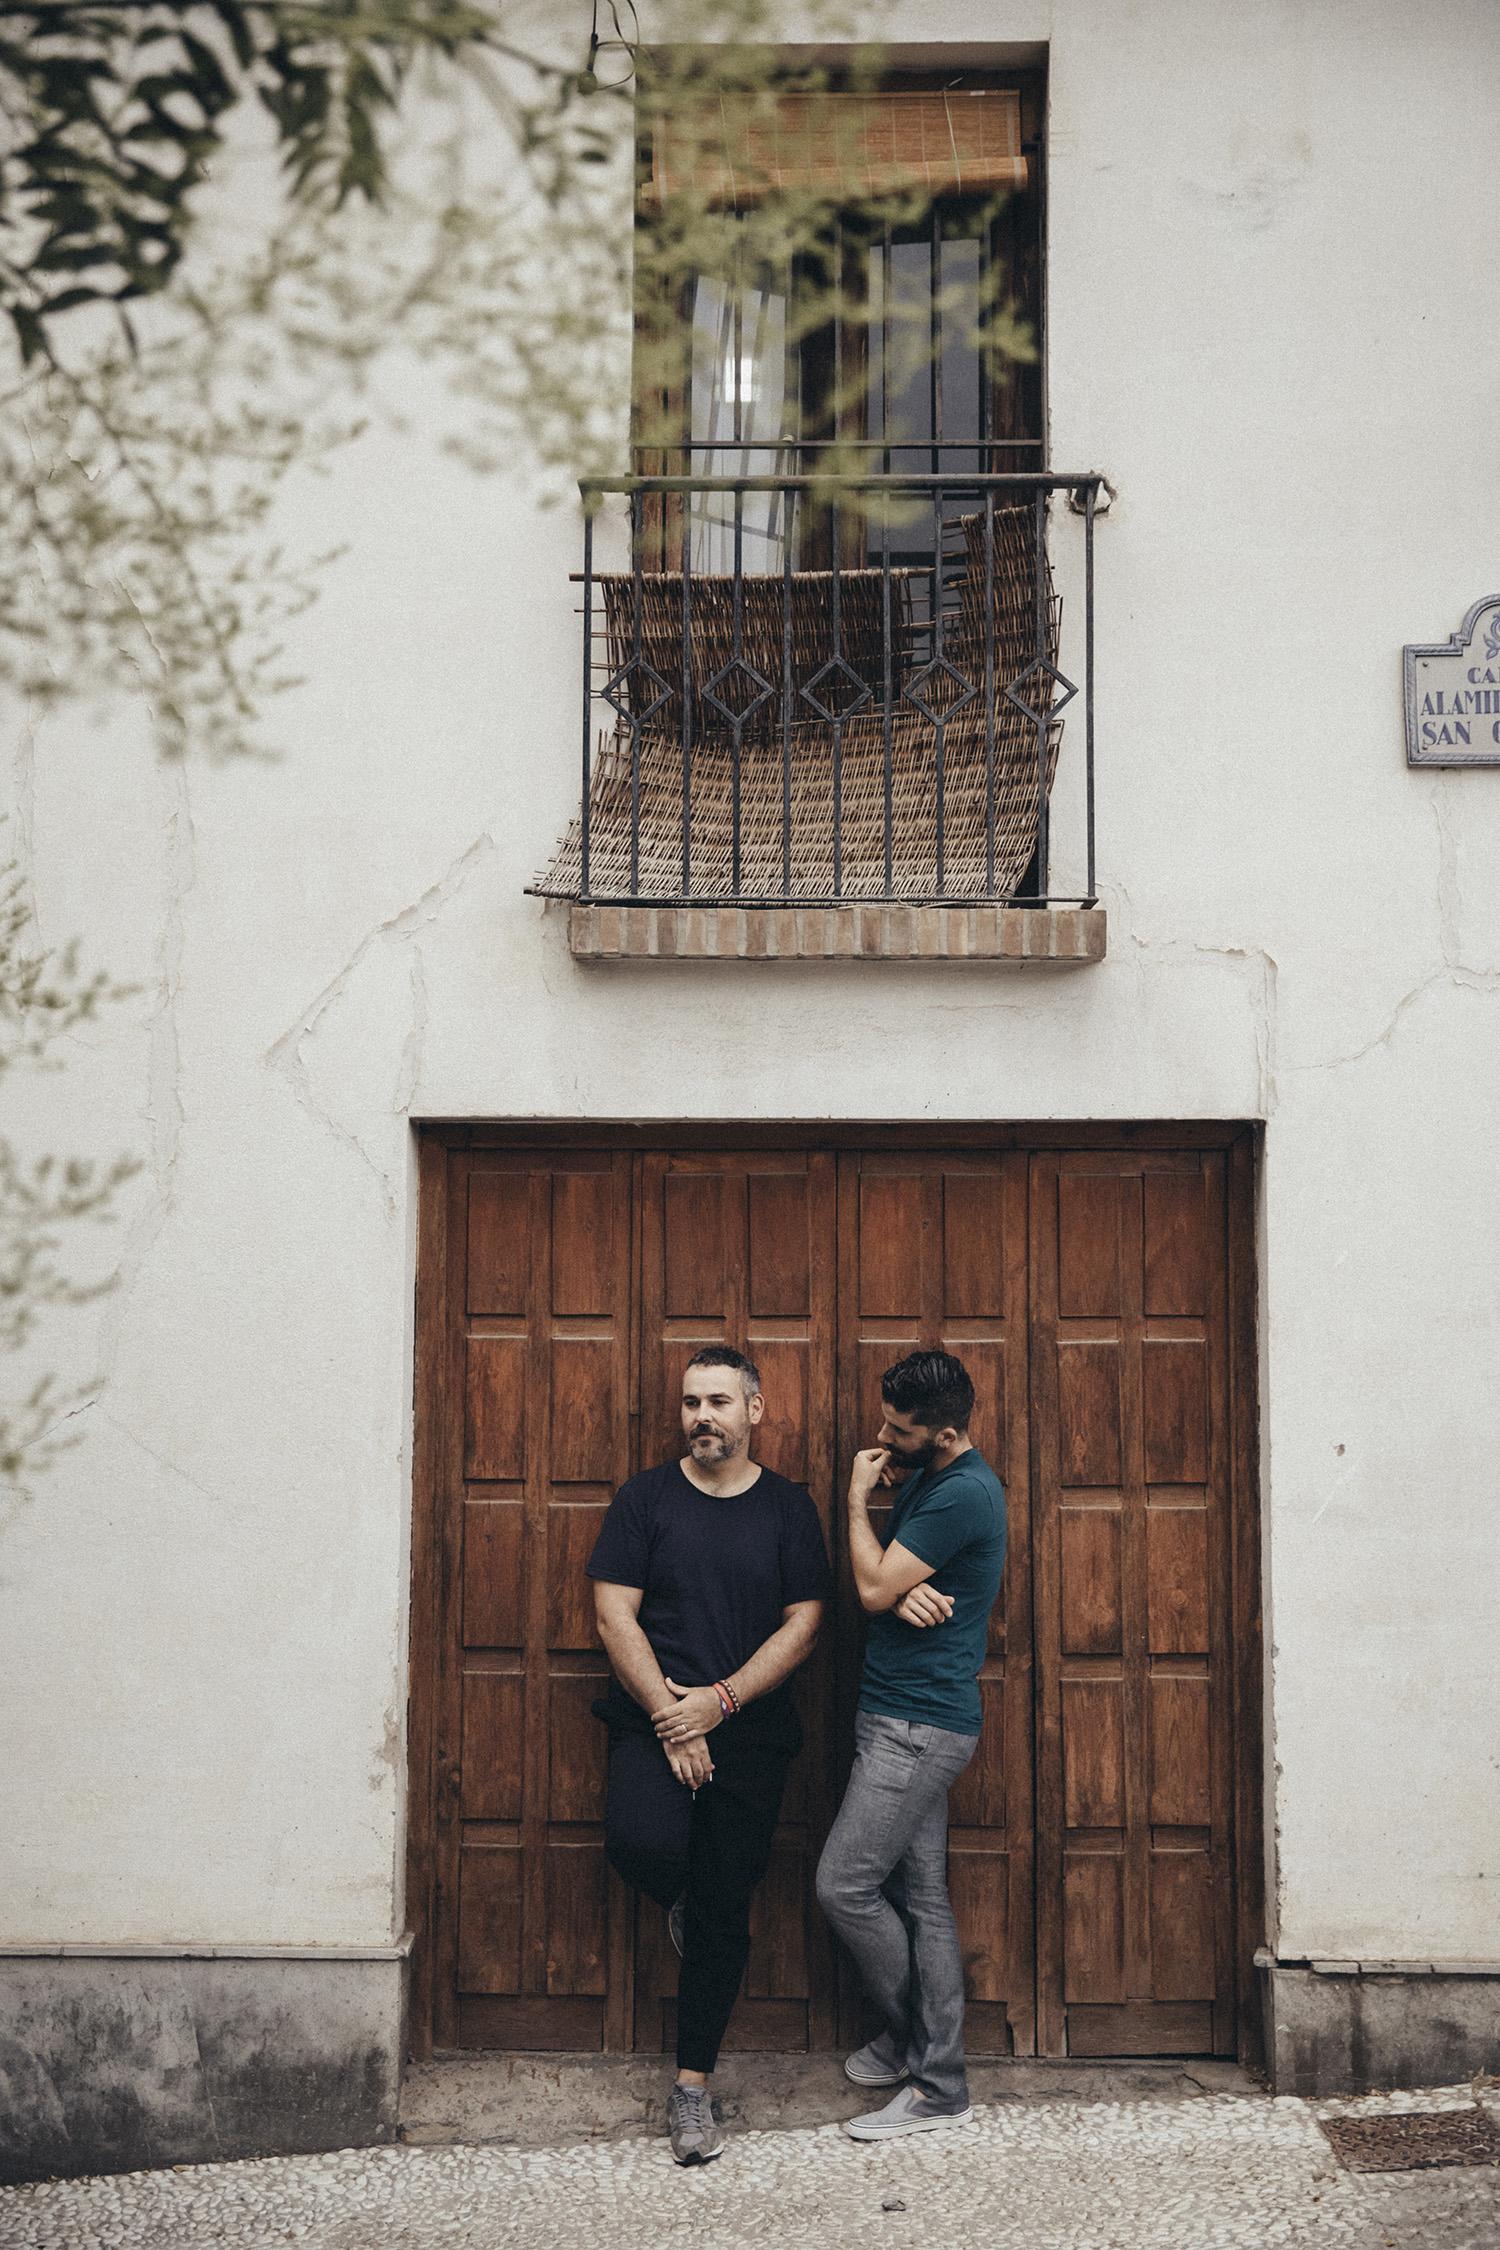 preboda-granada-serrallo-fotografo-boda-lgtb-gay-Jose_Reyes-13.jpg